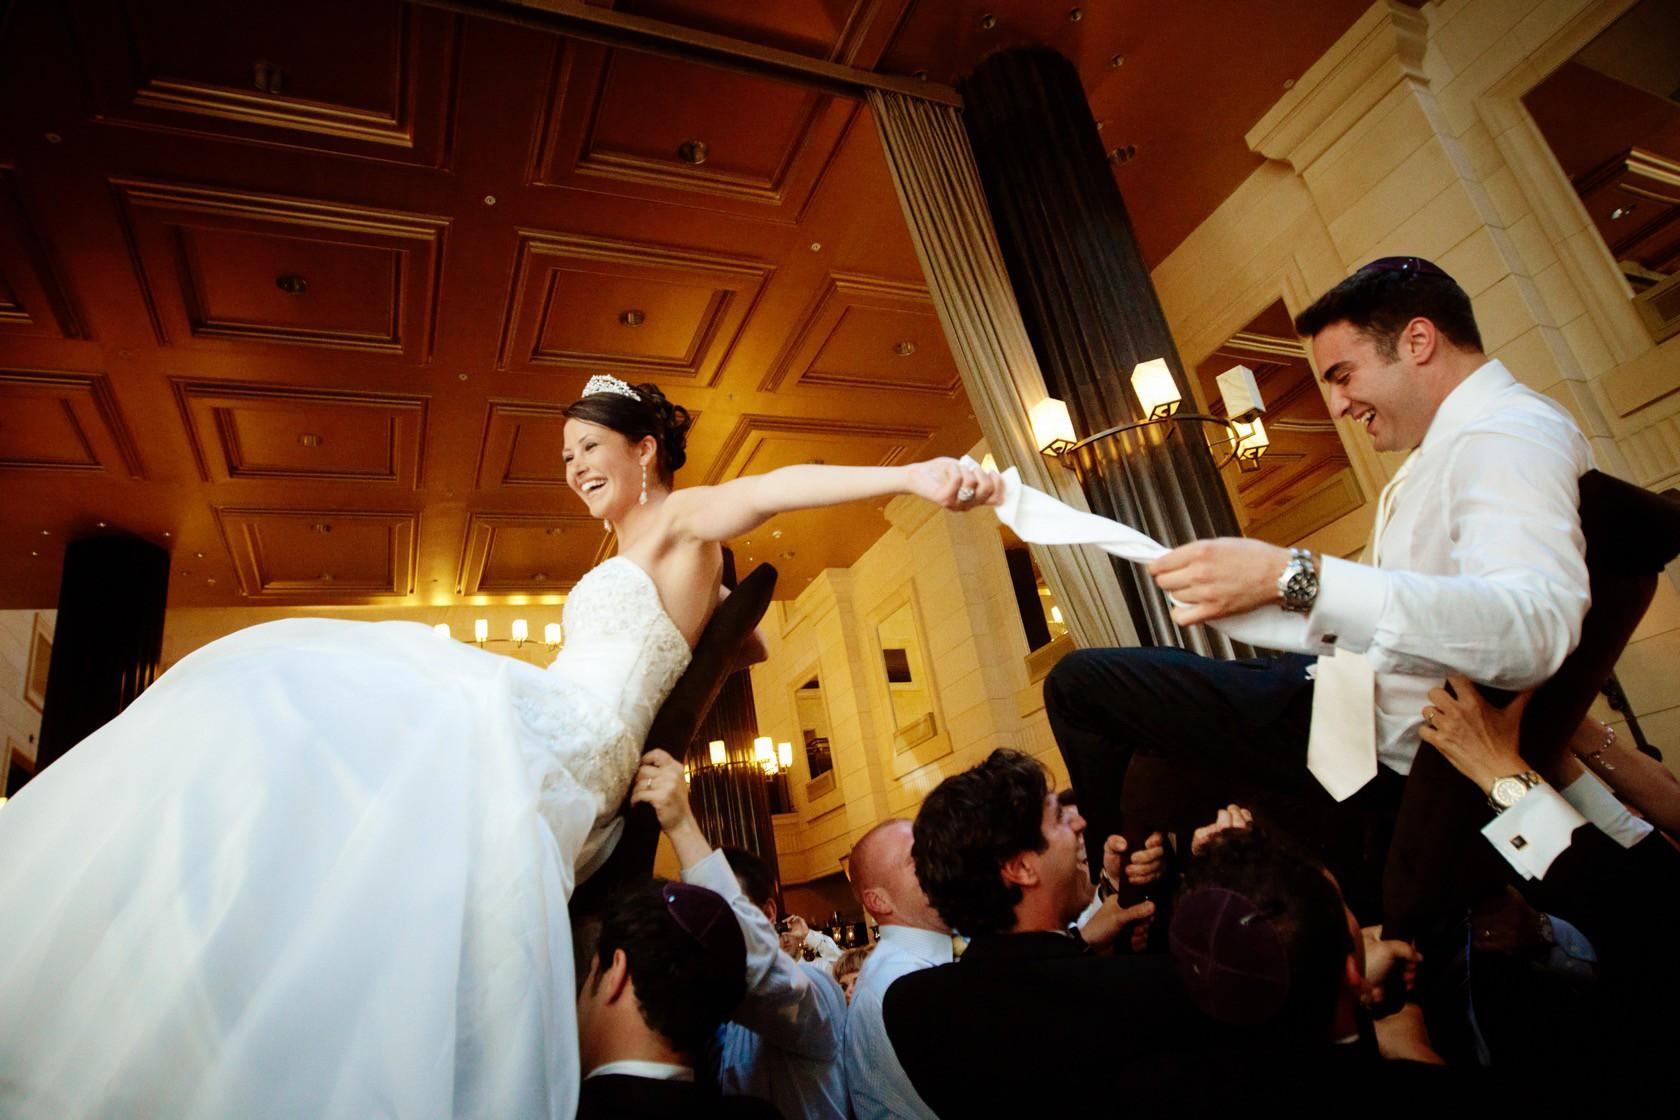 stephen sager photography 0122 fine art wedding photography